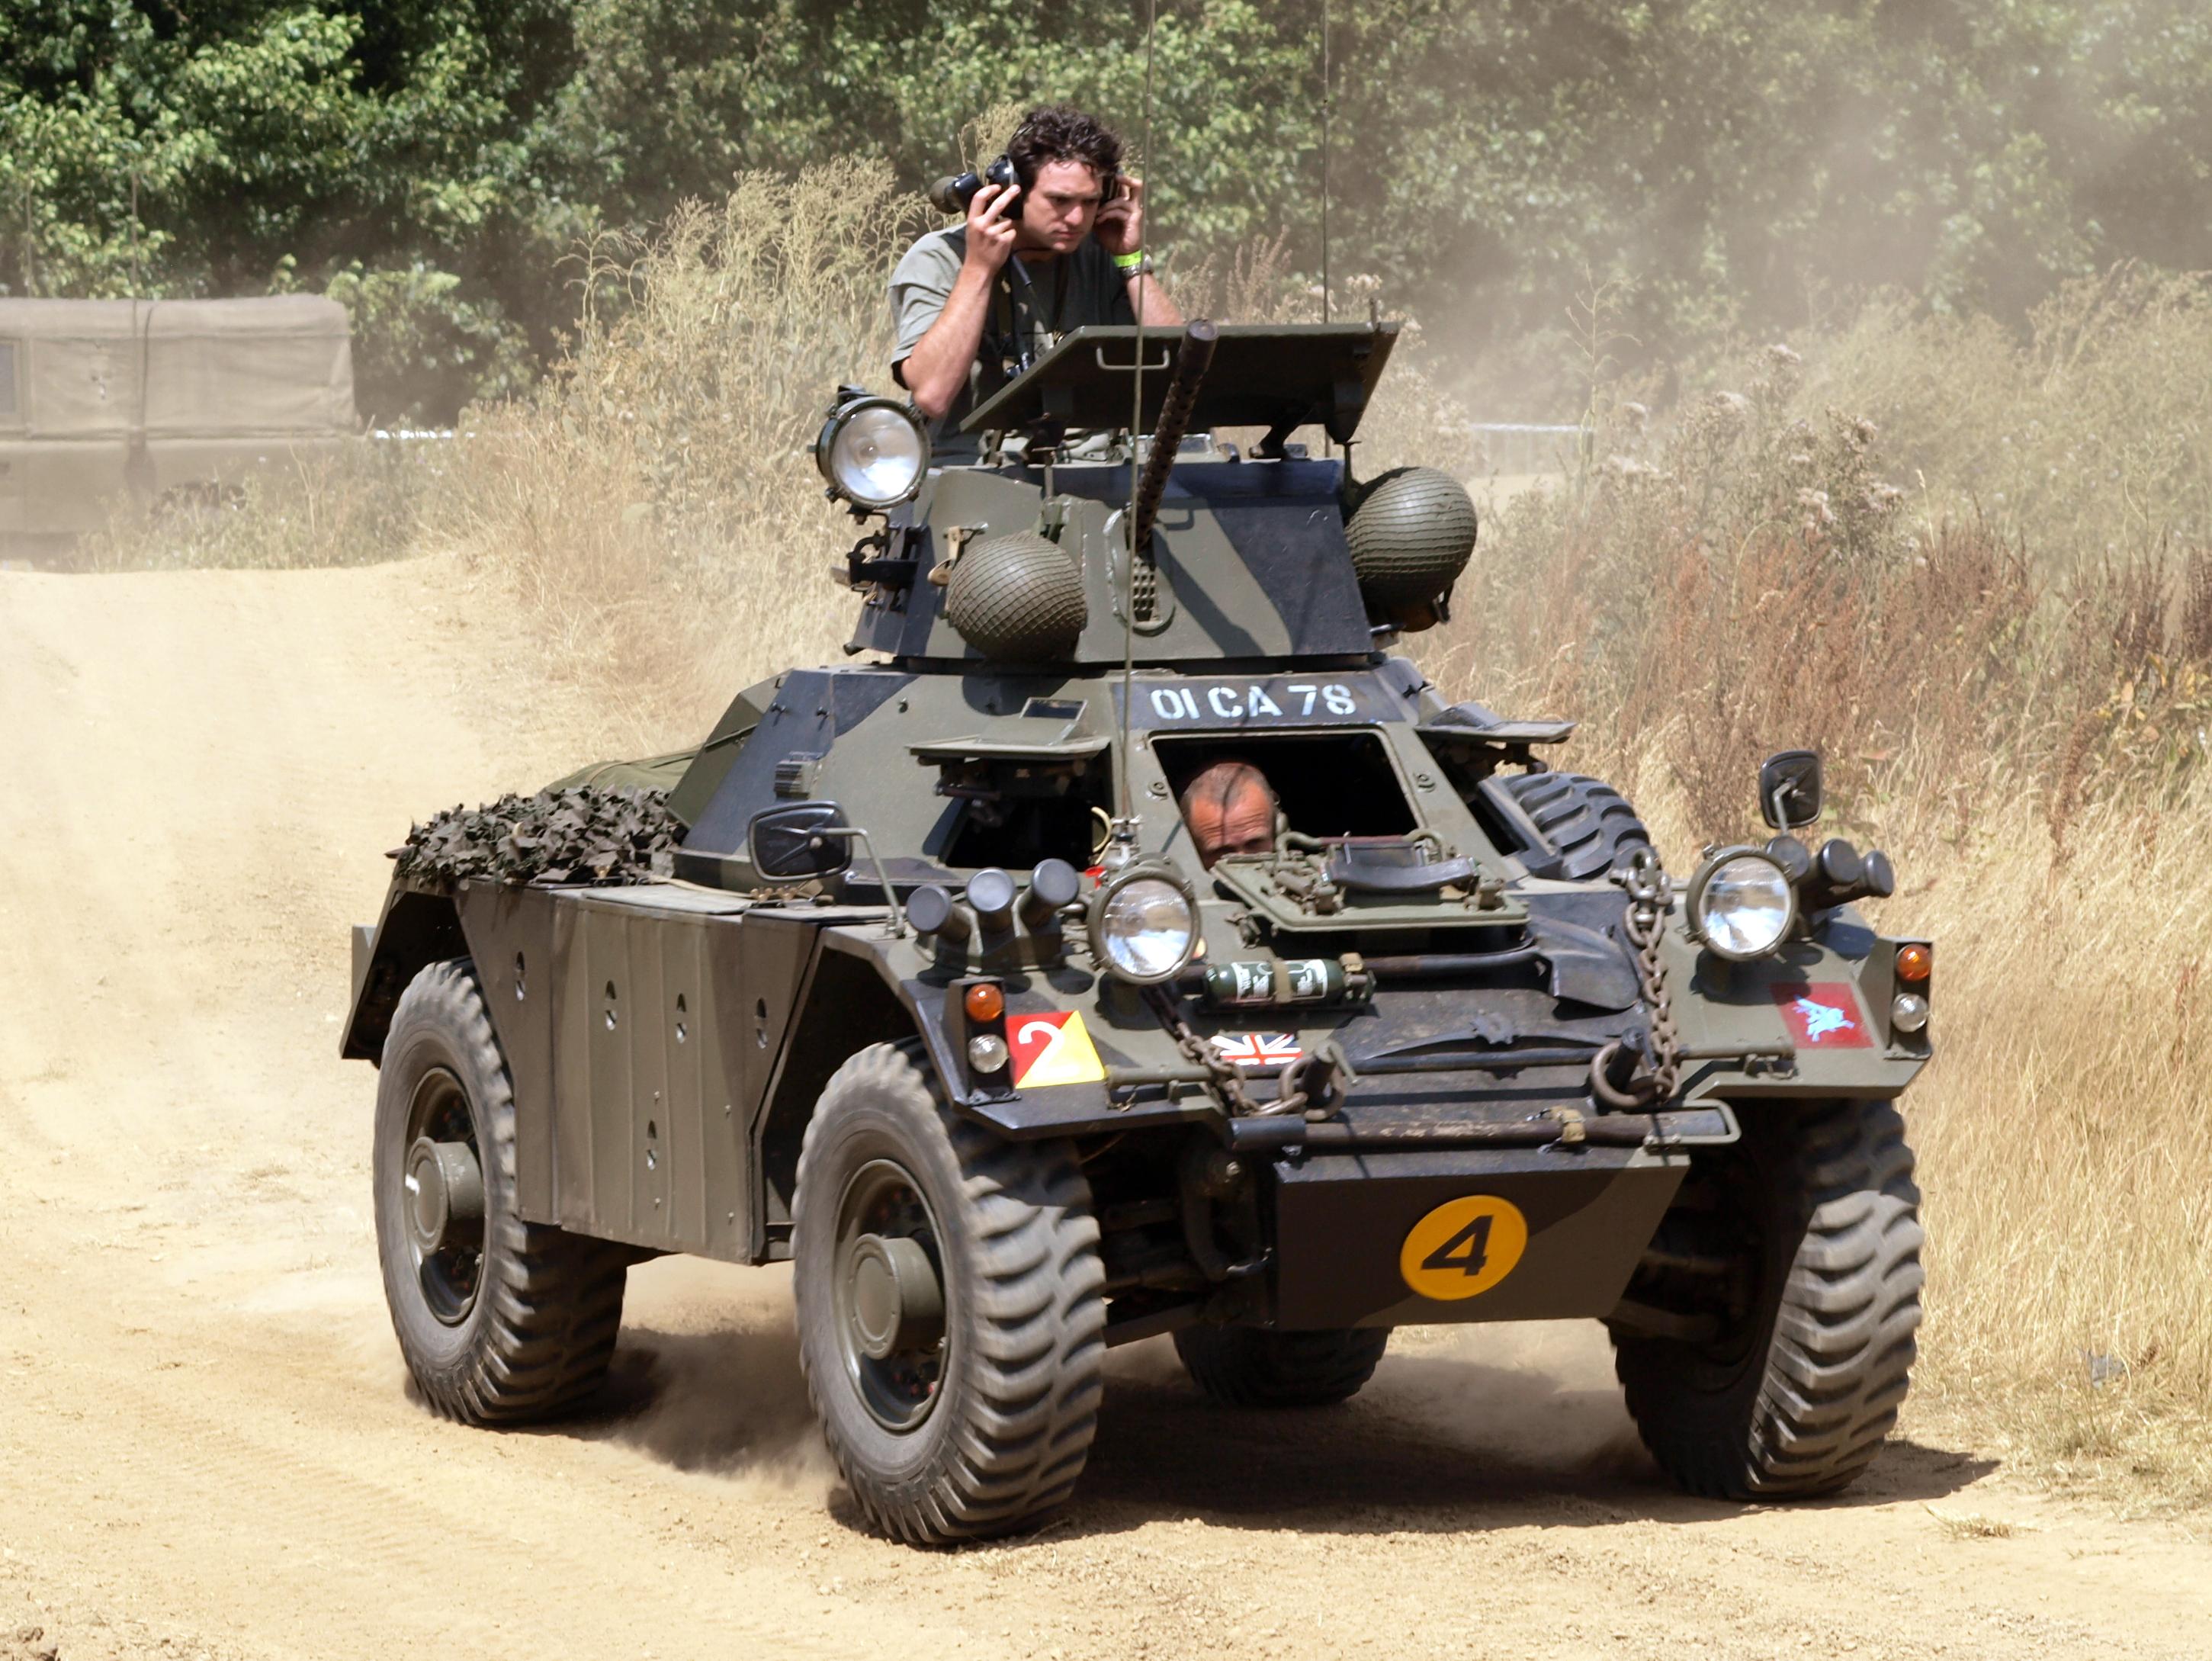 ferret armored scout car for sale autos post. Black Bedroom Furniture Sets. Home Design Ideas